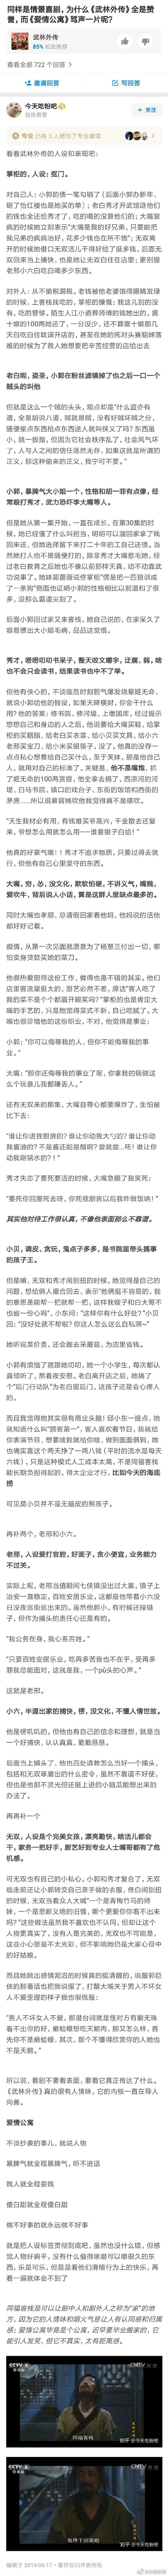 GIF动态图分享0617:仰泳-91-『游乐宫』Youlegong.com 第24张